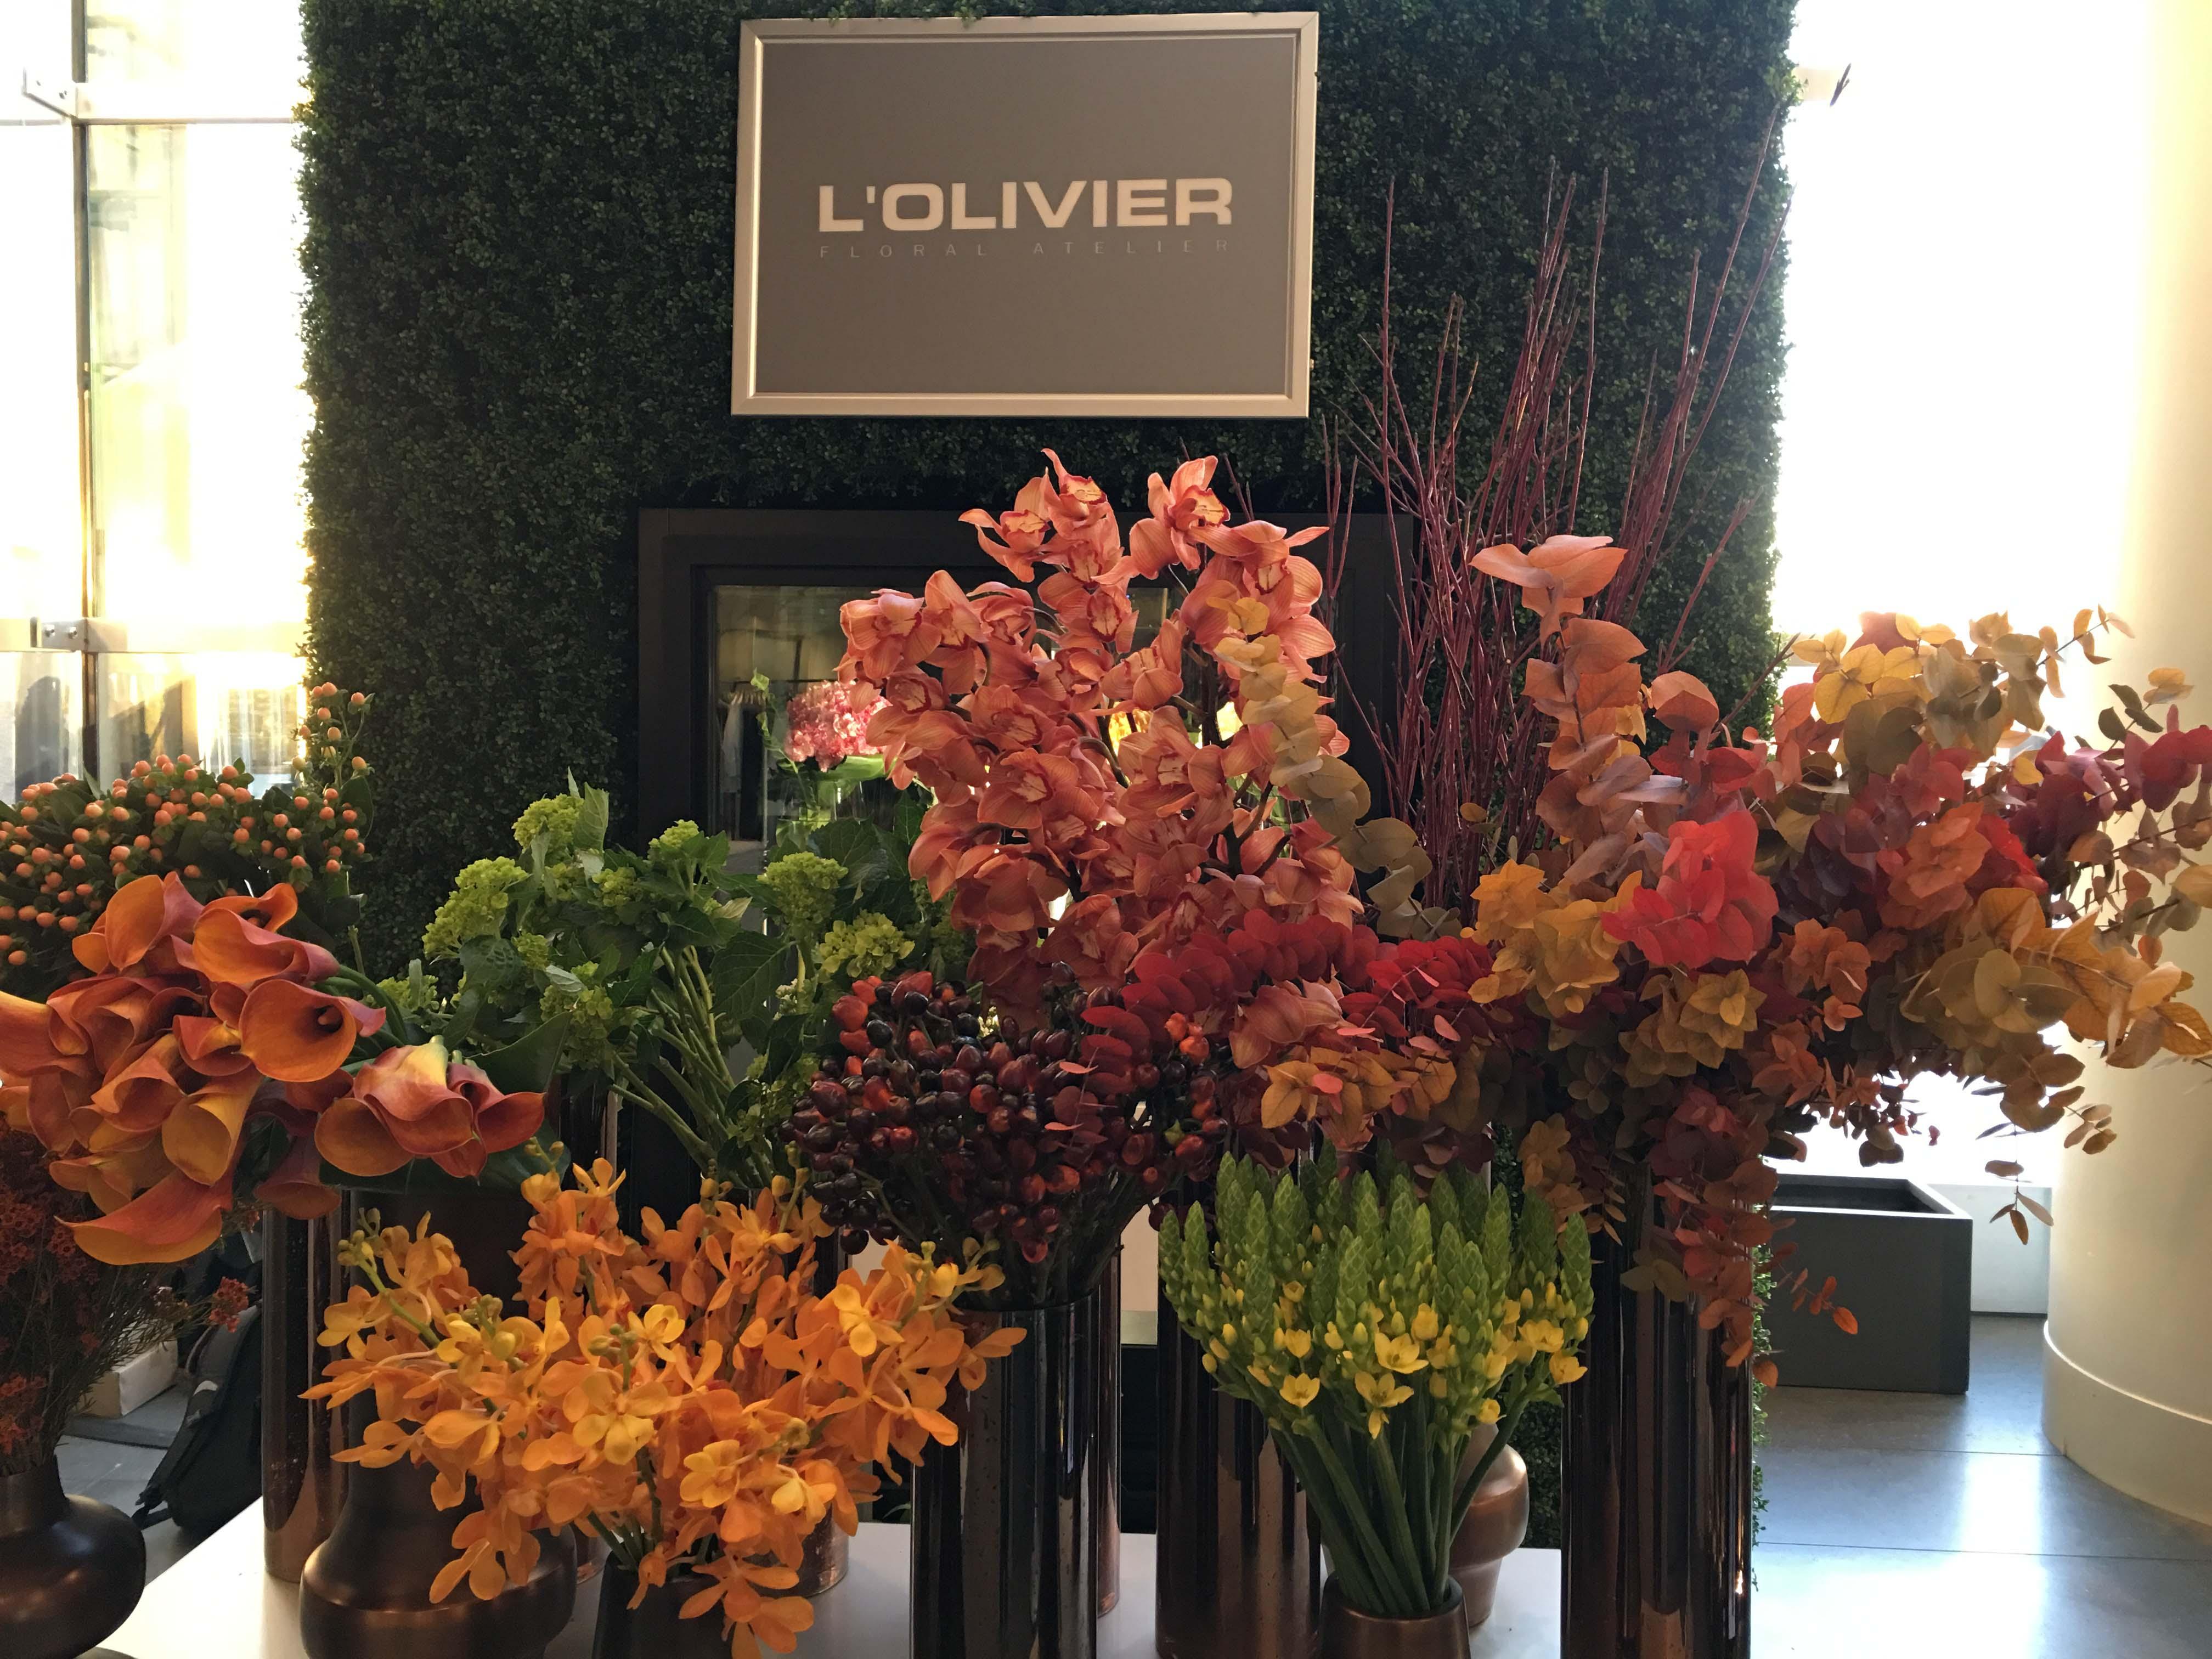 LOlivier florist